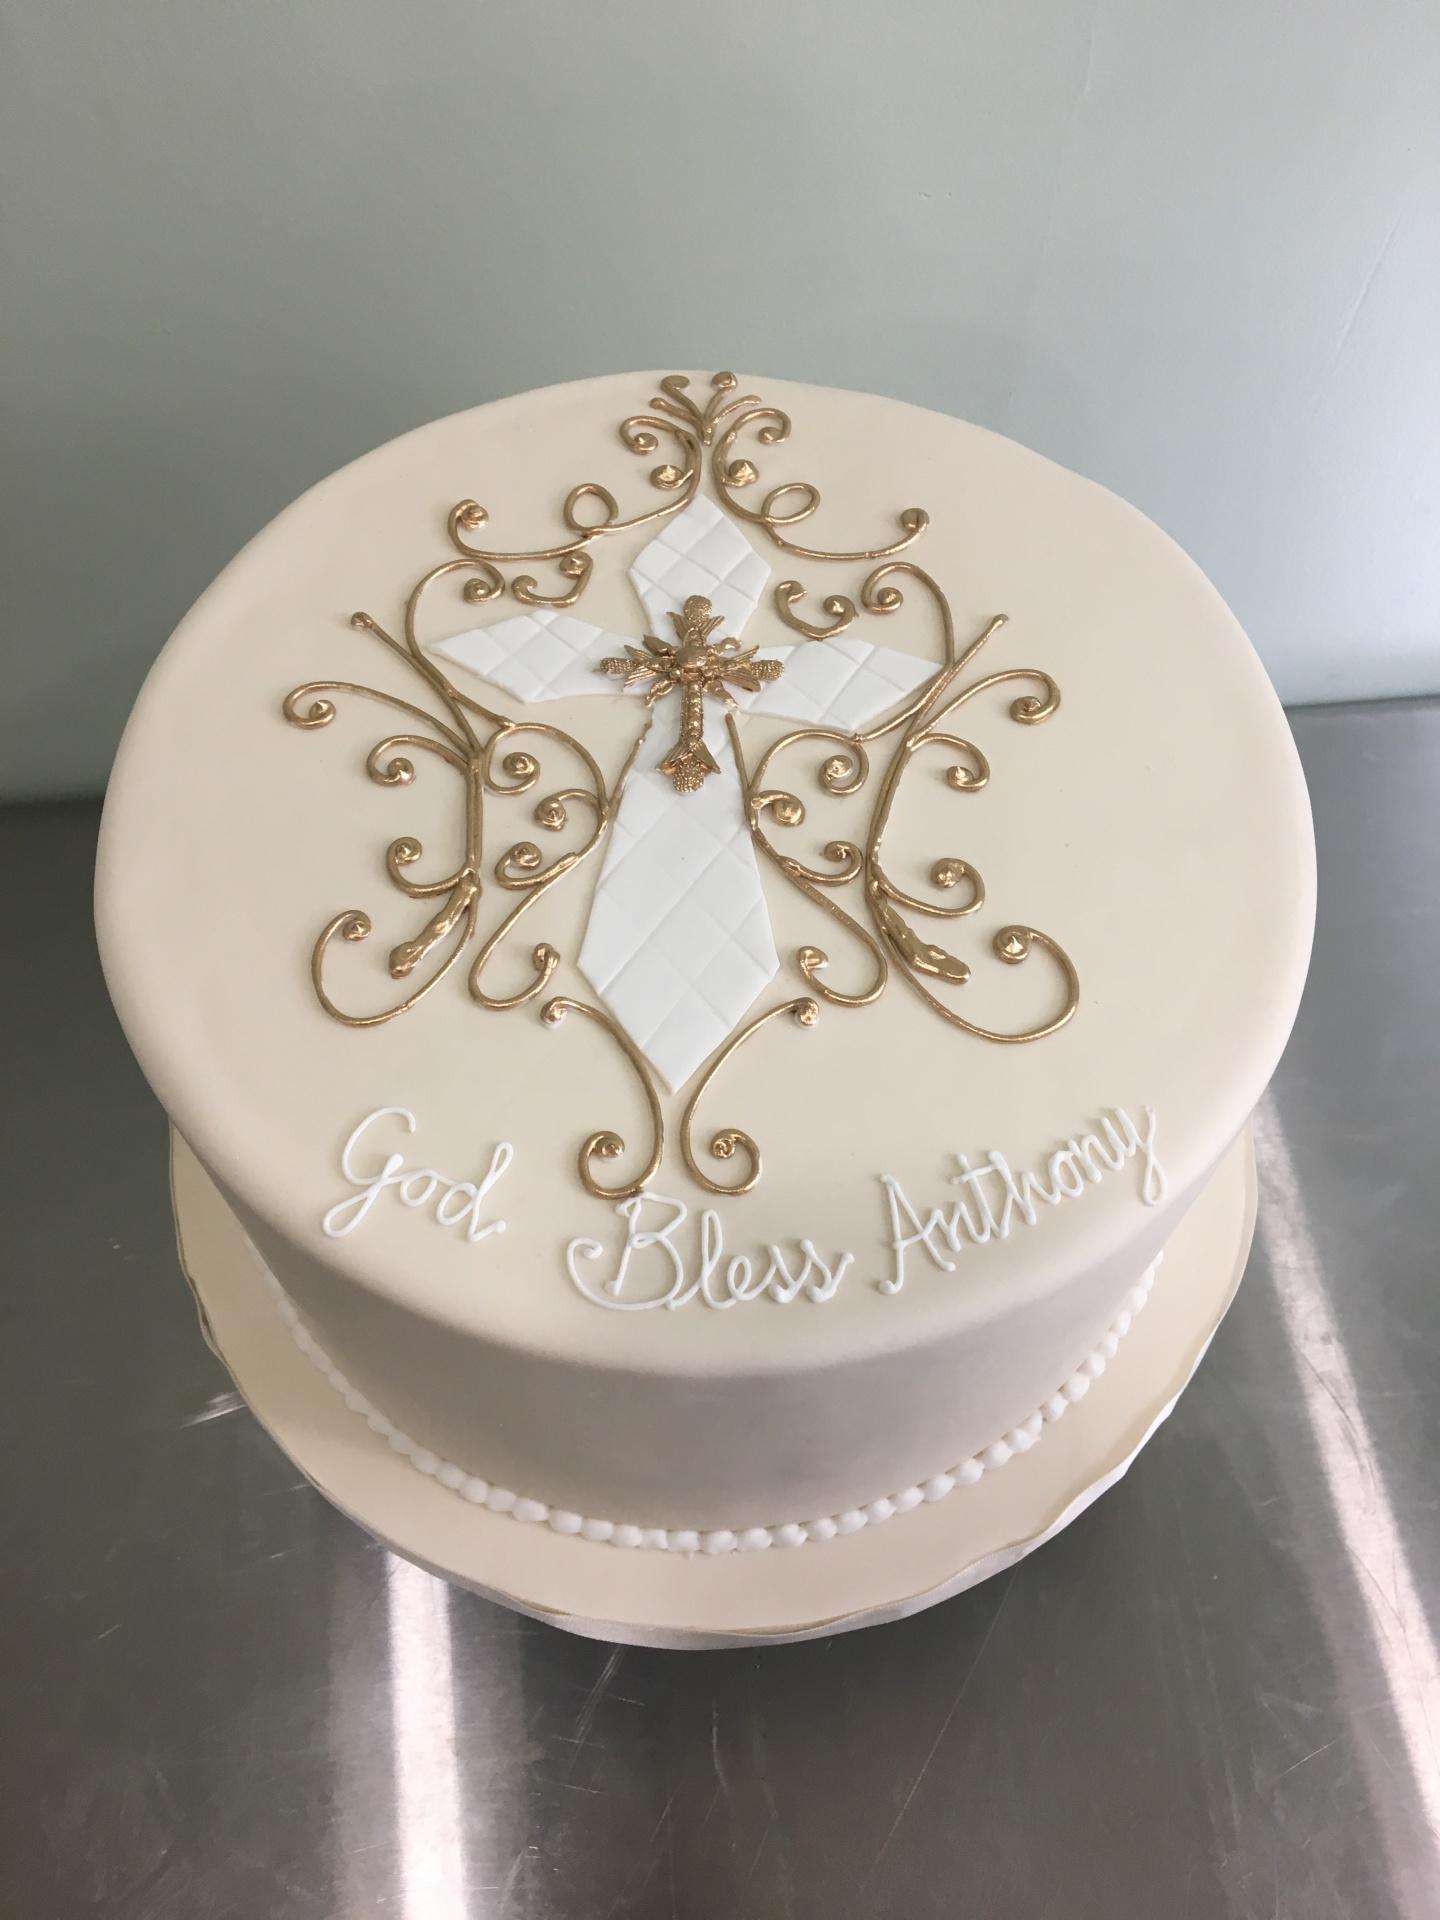 Confirmation Cake Ivory and Gold Cake NJ Cakes